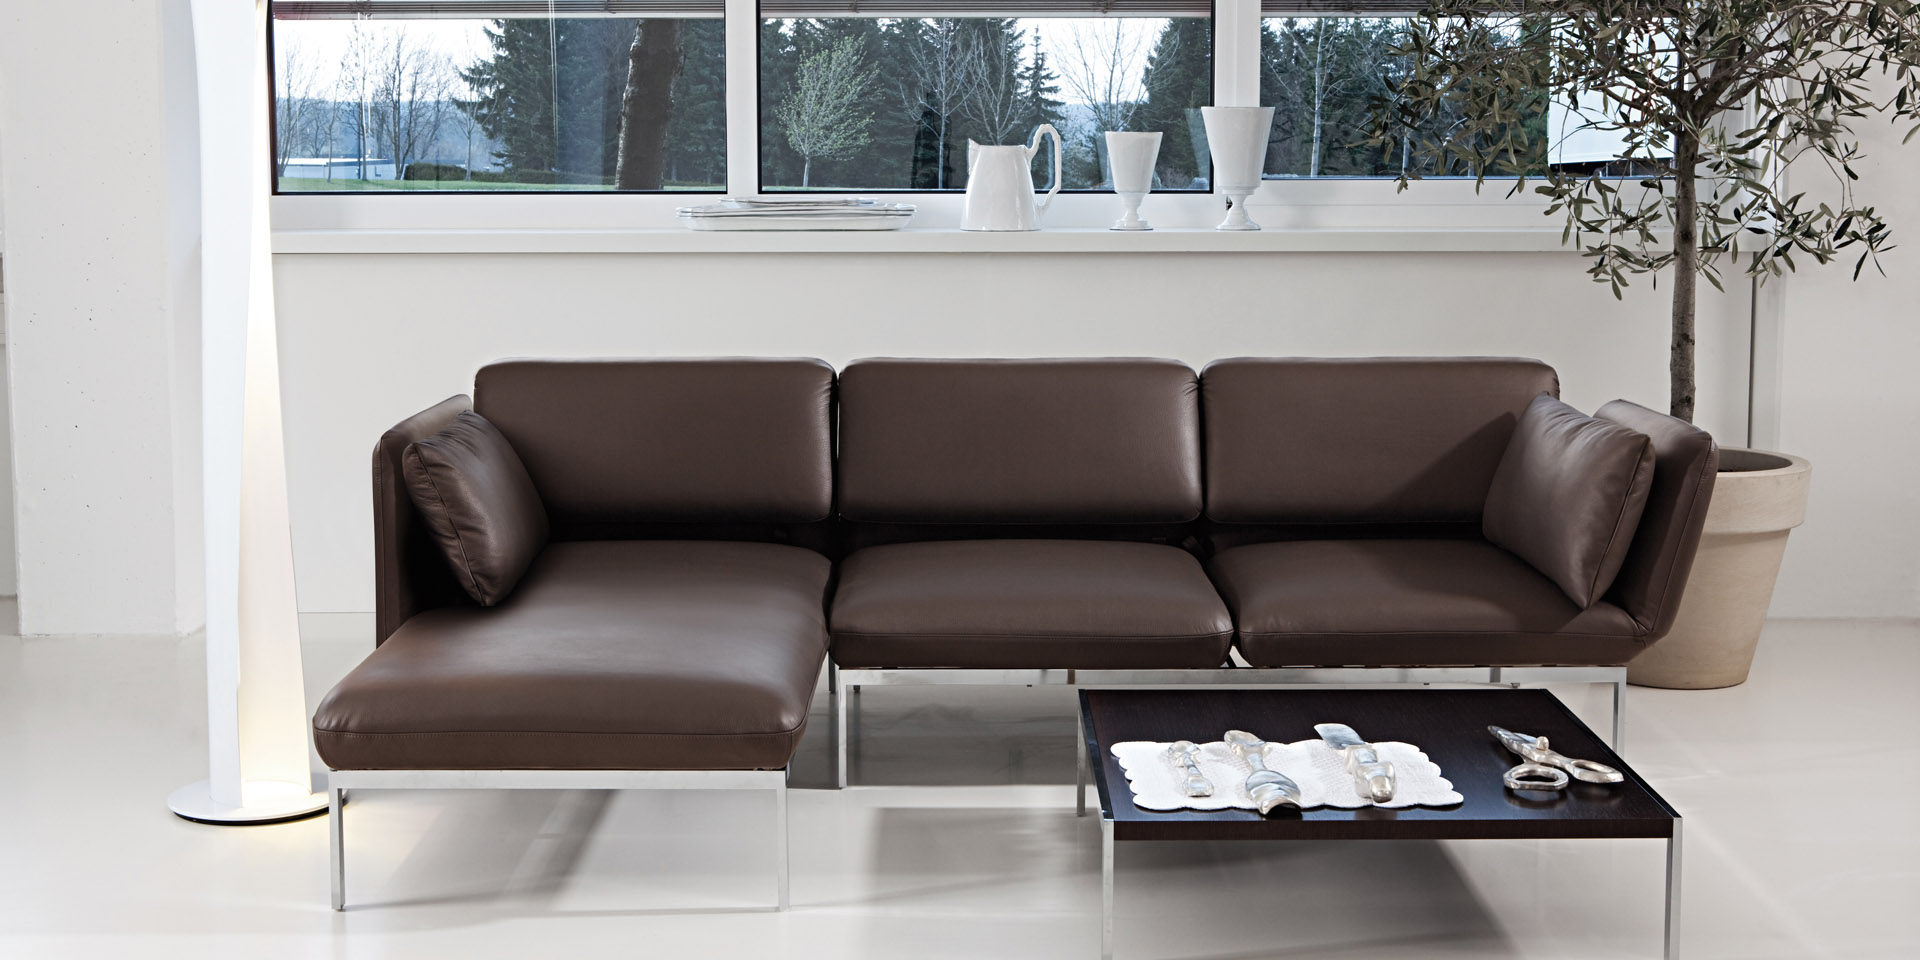 br hl bei fenchel wohnfaszination gmbh. Black Bedroom Furniture Sets. Home Design Ideas